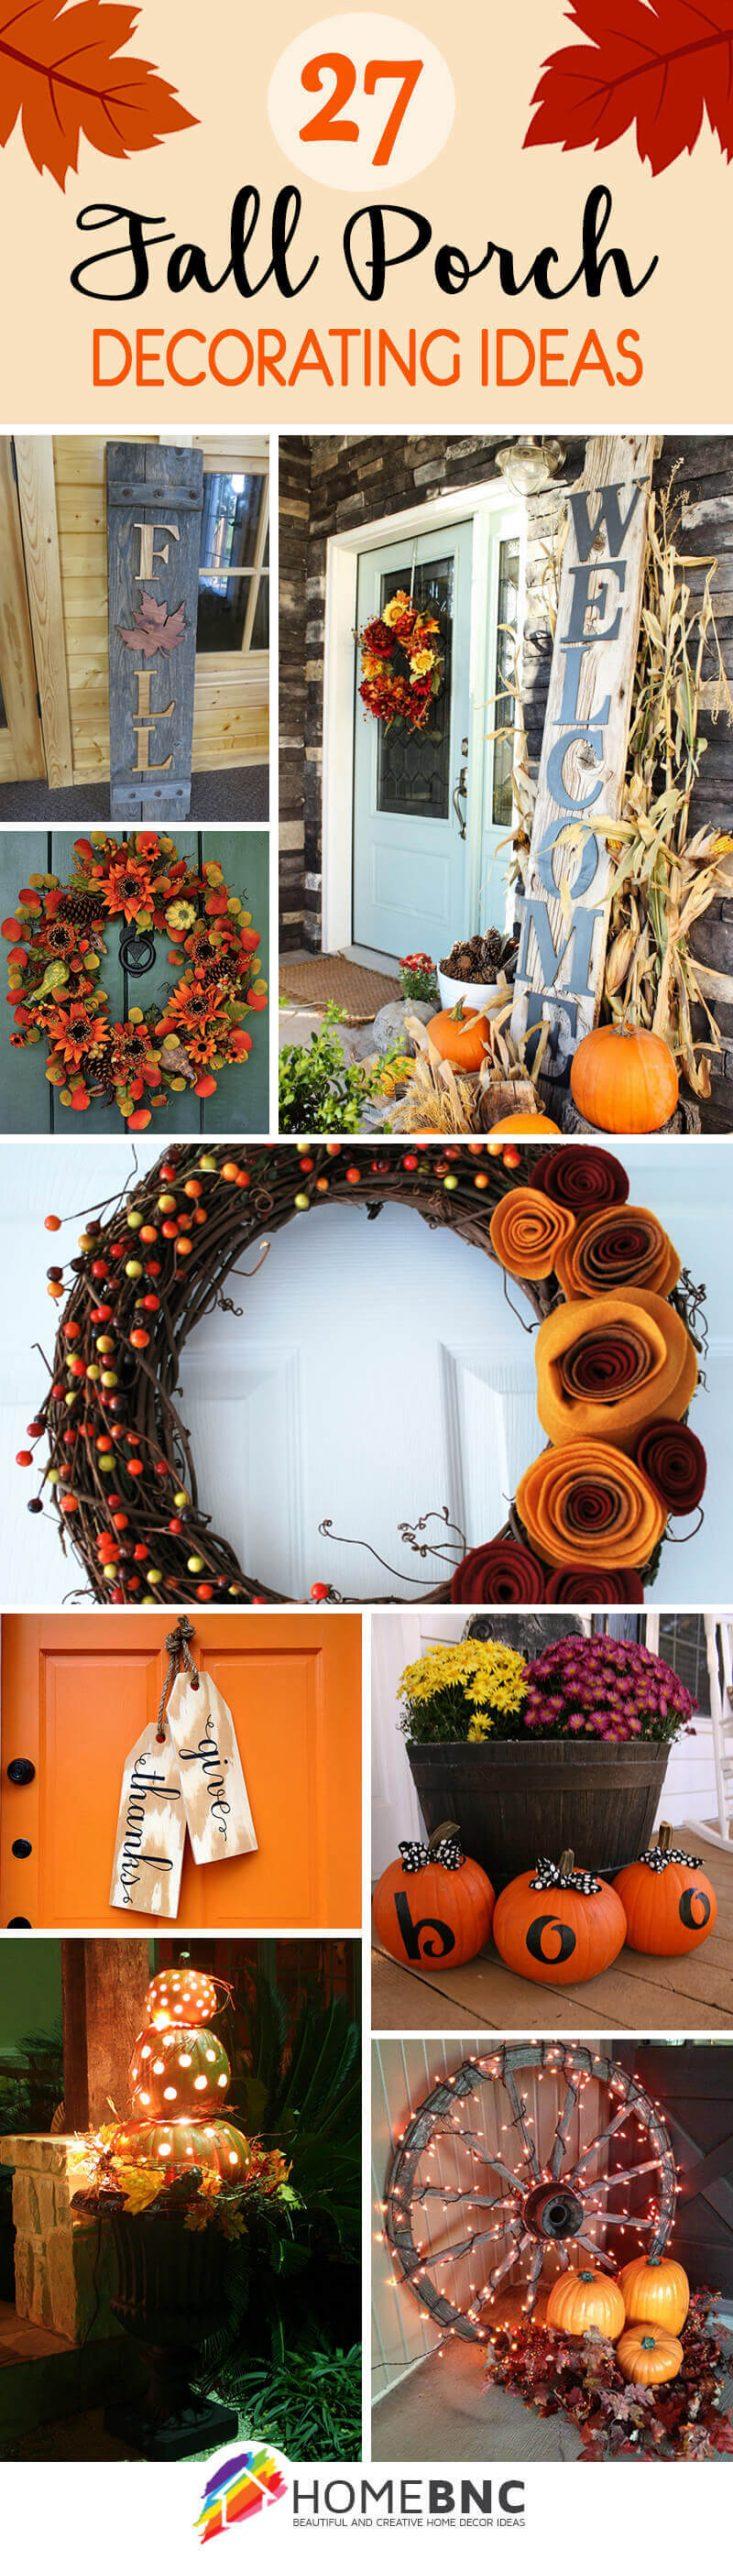 Fall Porch Decoration Ideas